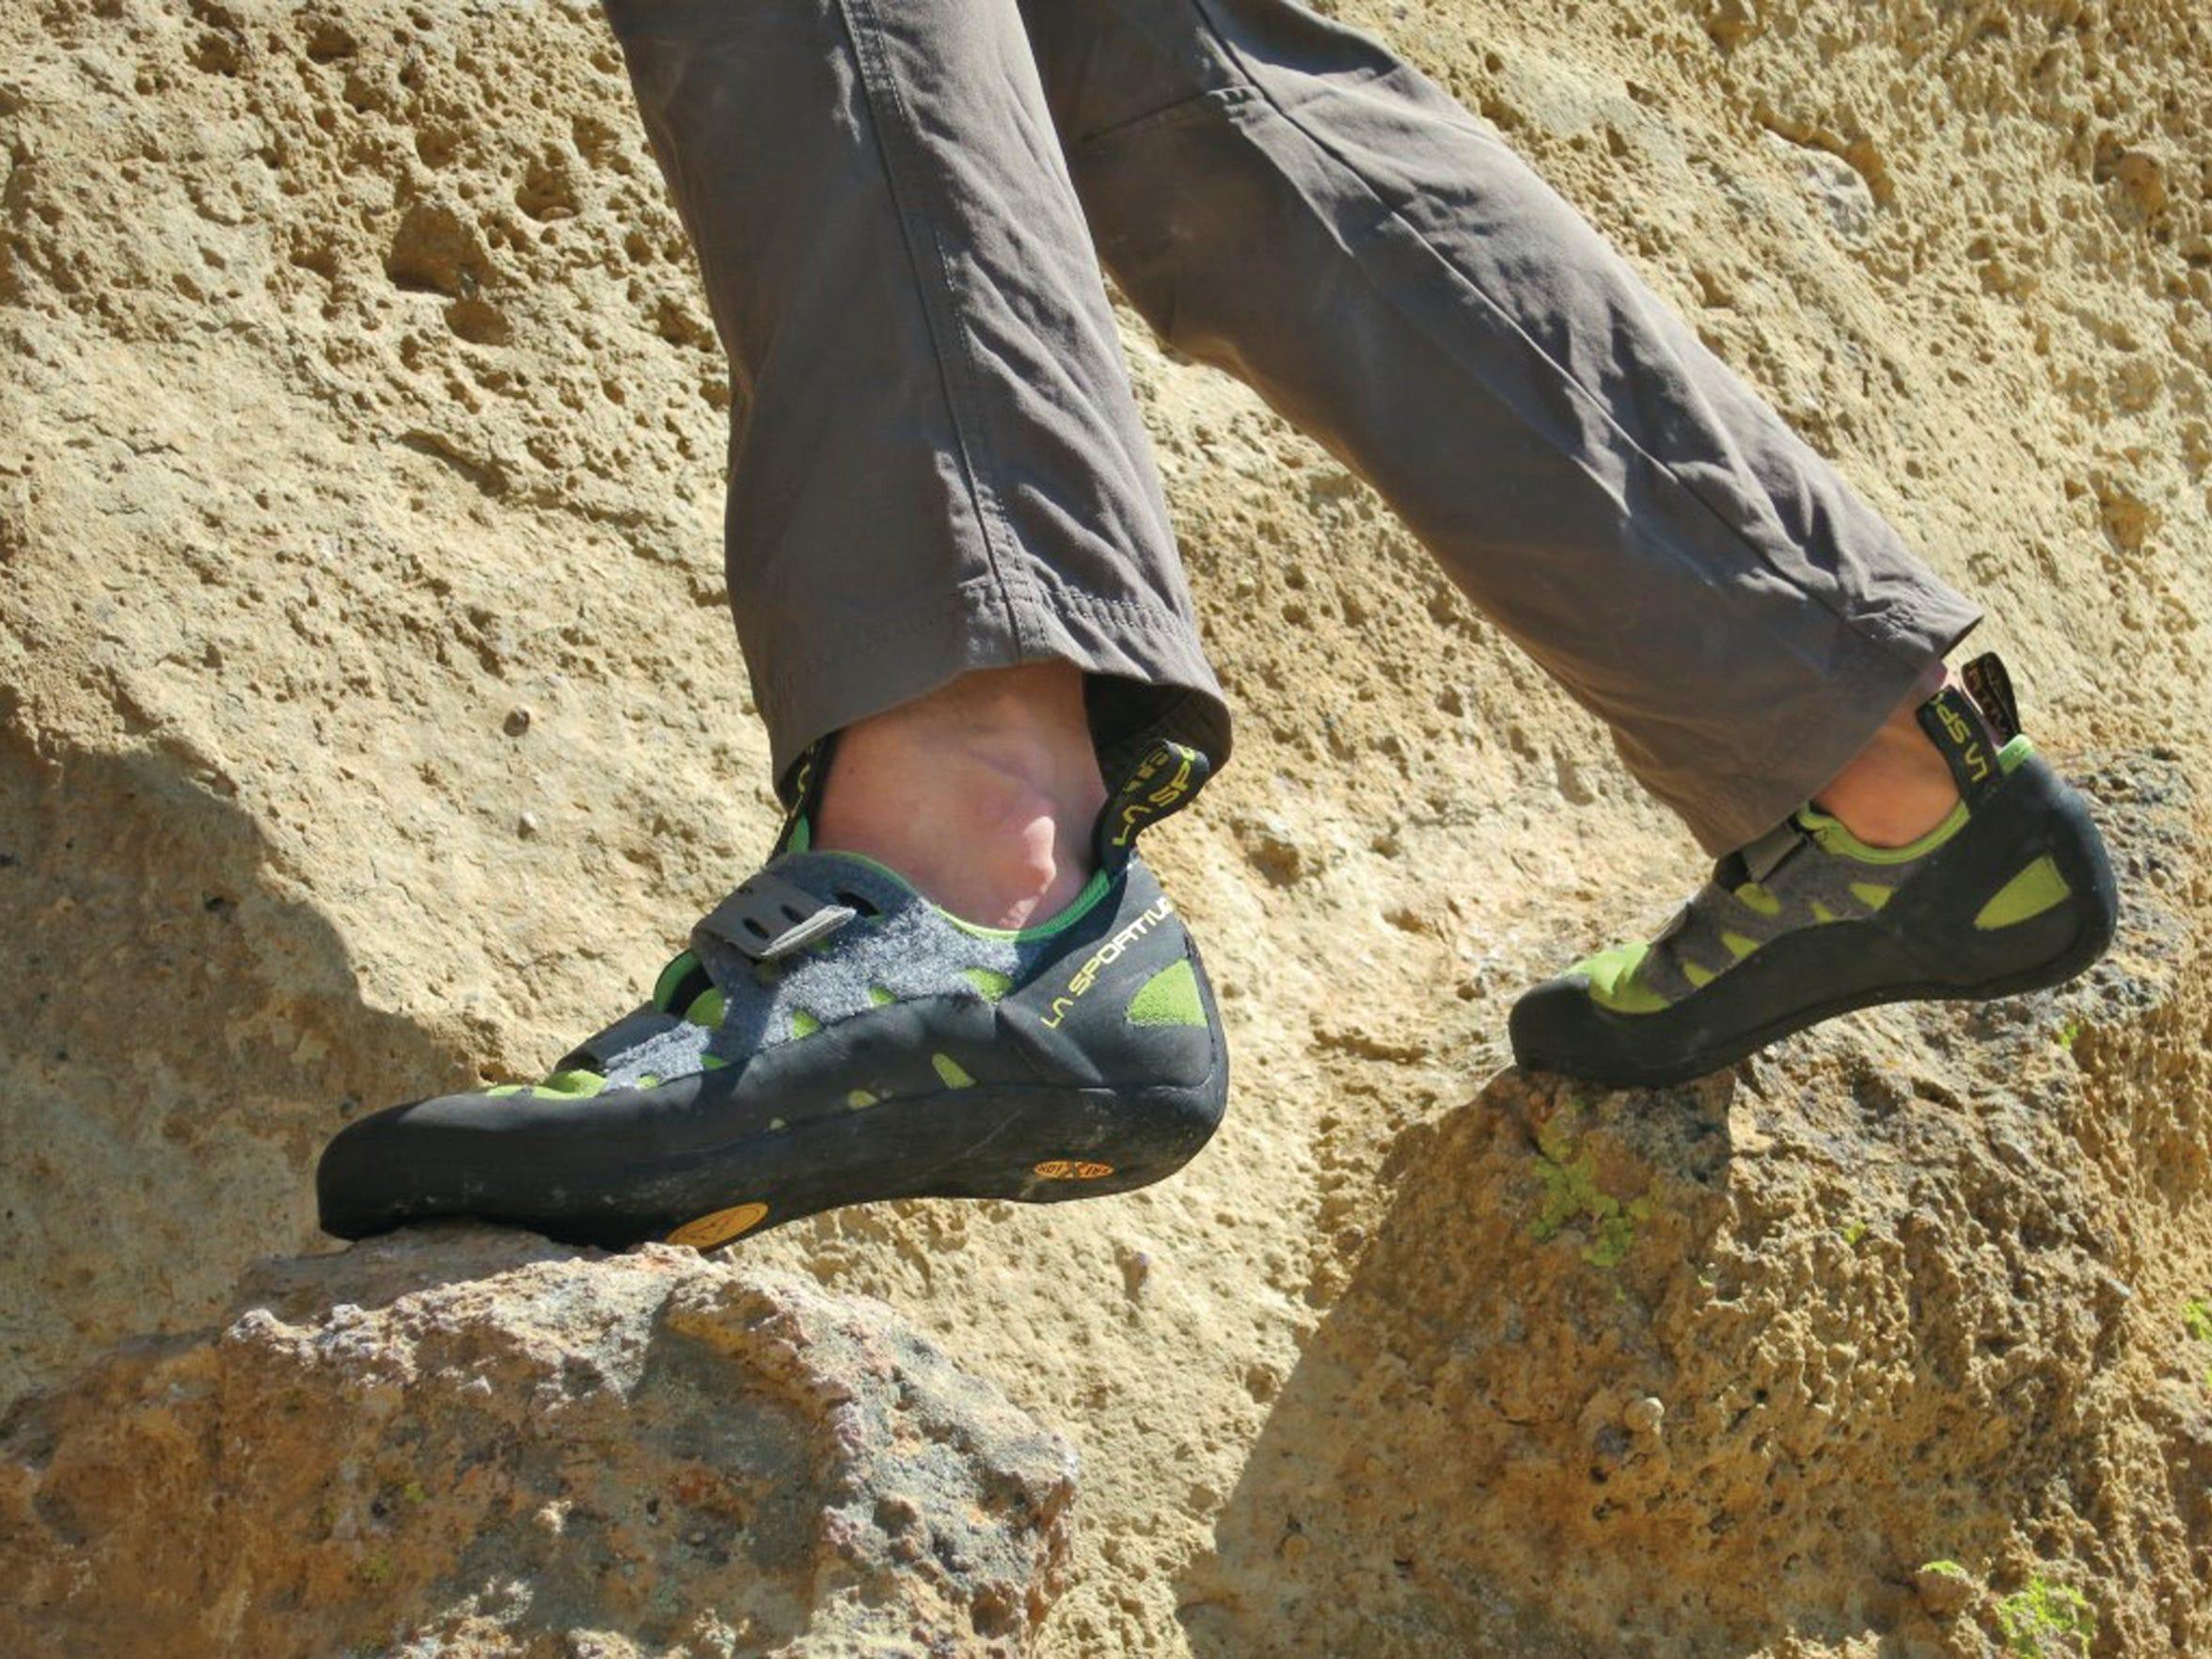 Climbing shoes made by La Sportiva.